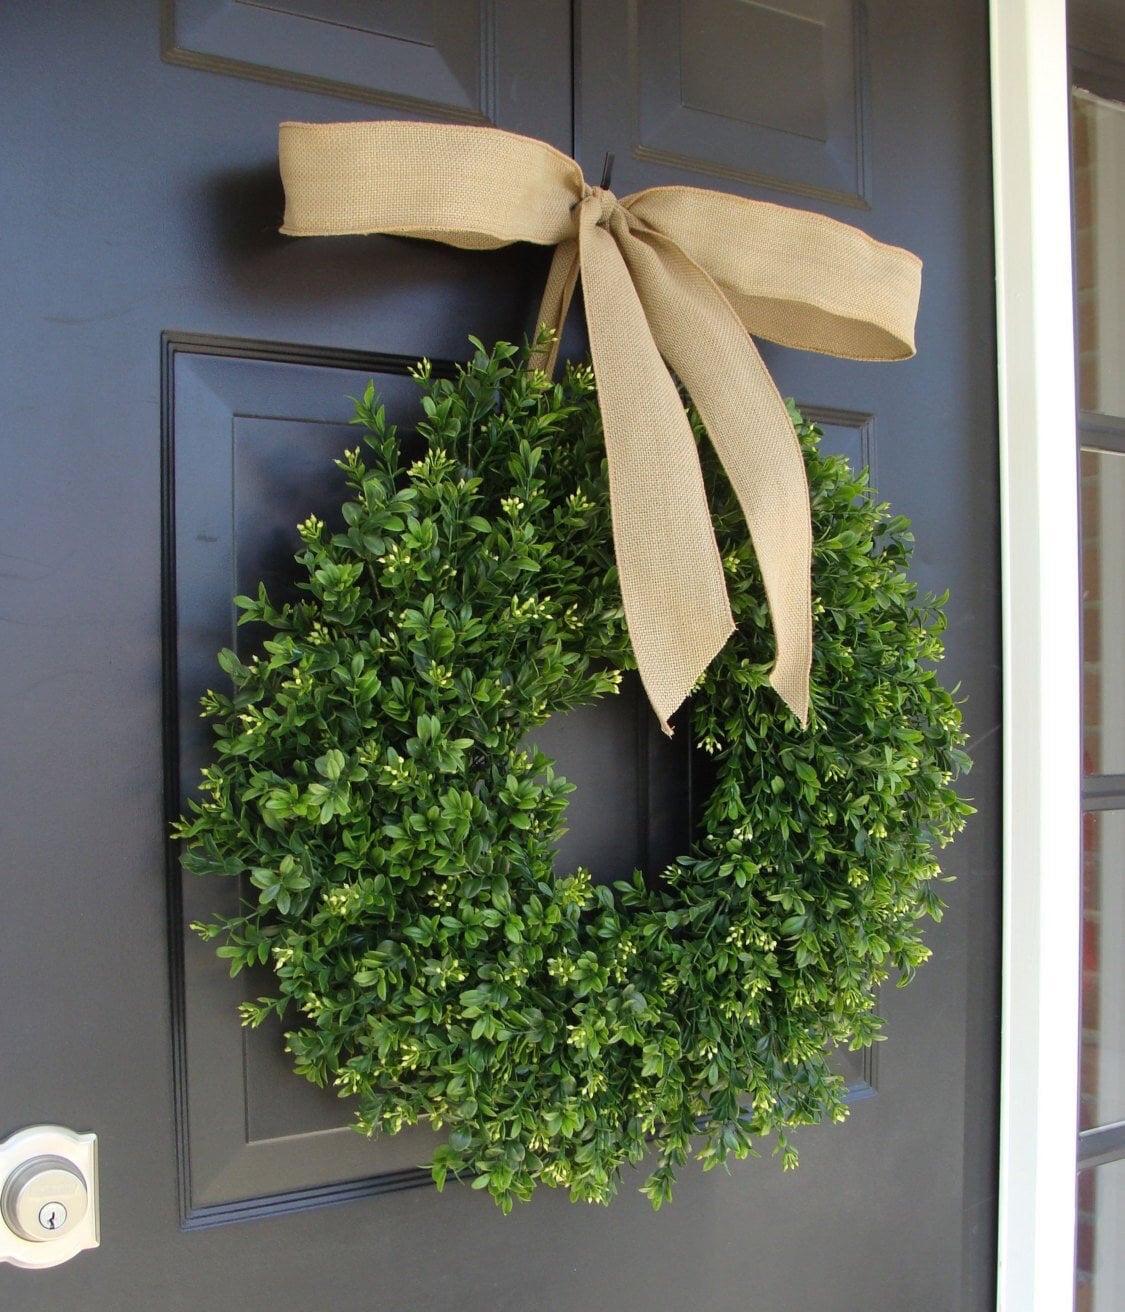 Thin Boxwood Wreath Spring Wreath Year Round Wreath Door Wreath Wreath For Storm Door Wreath For Storm Door Outdoor Boxwood Decor